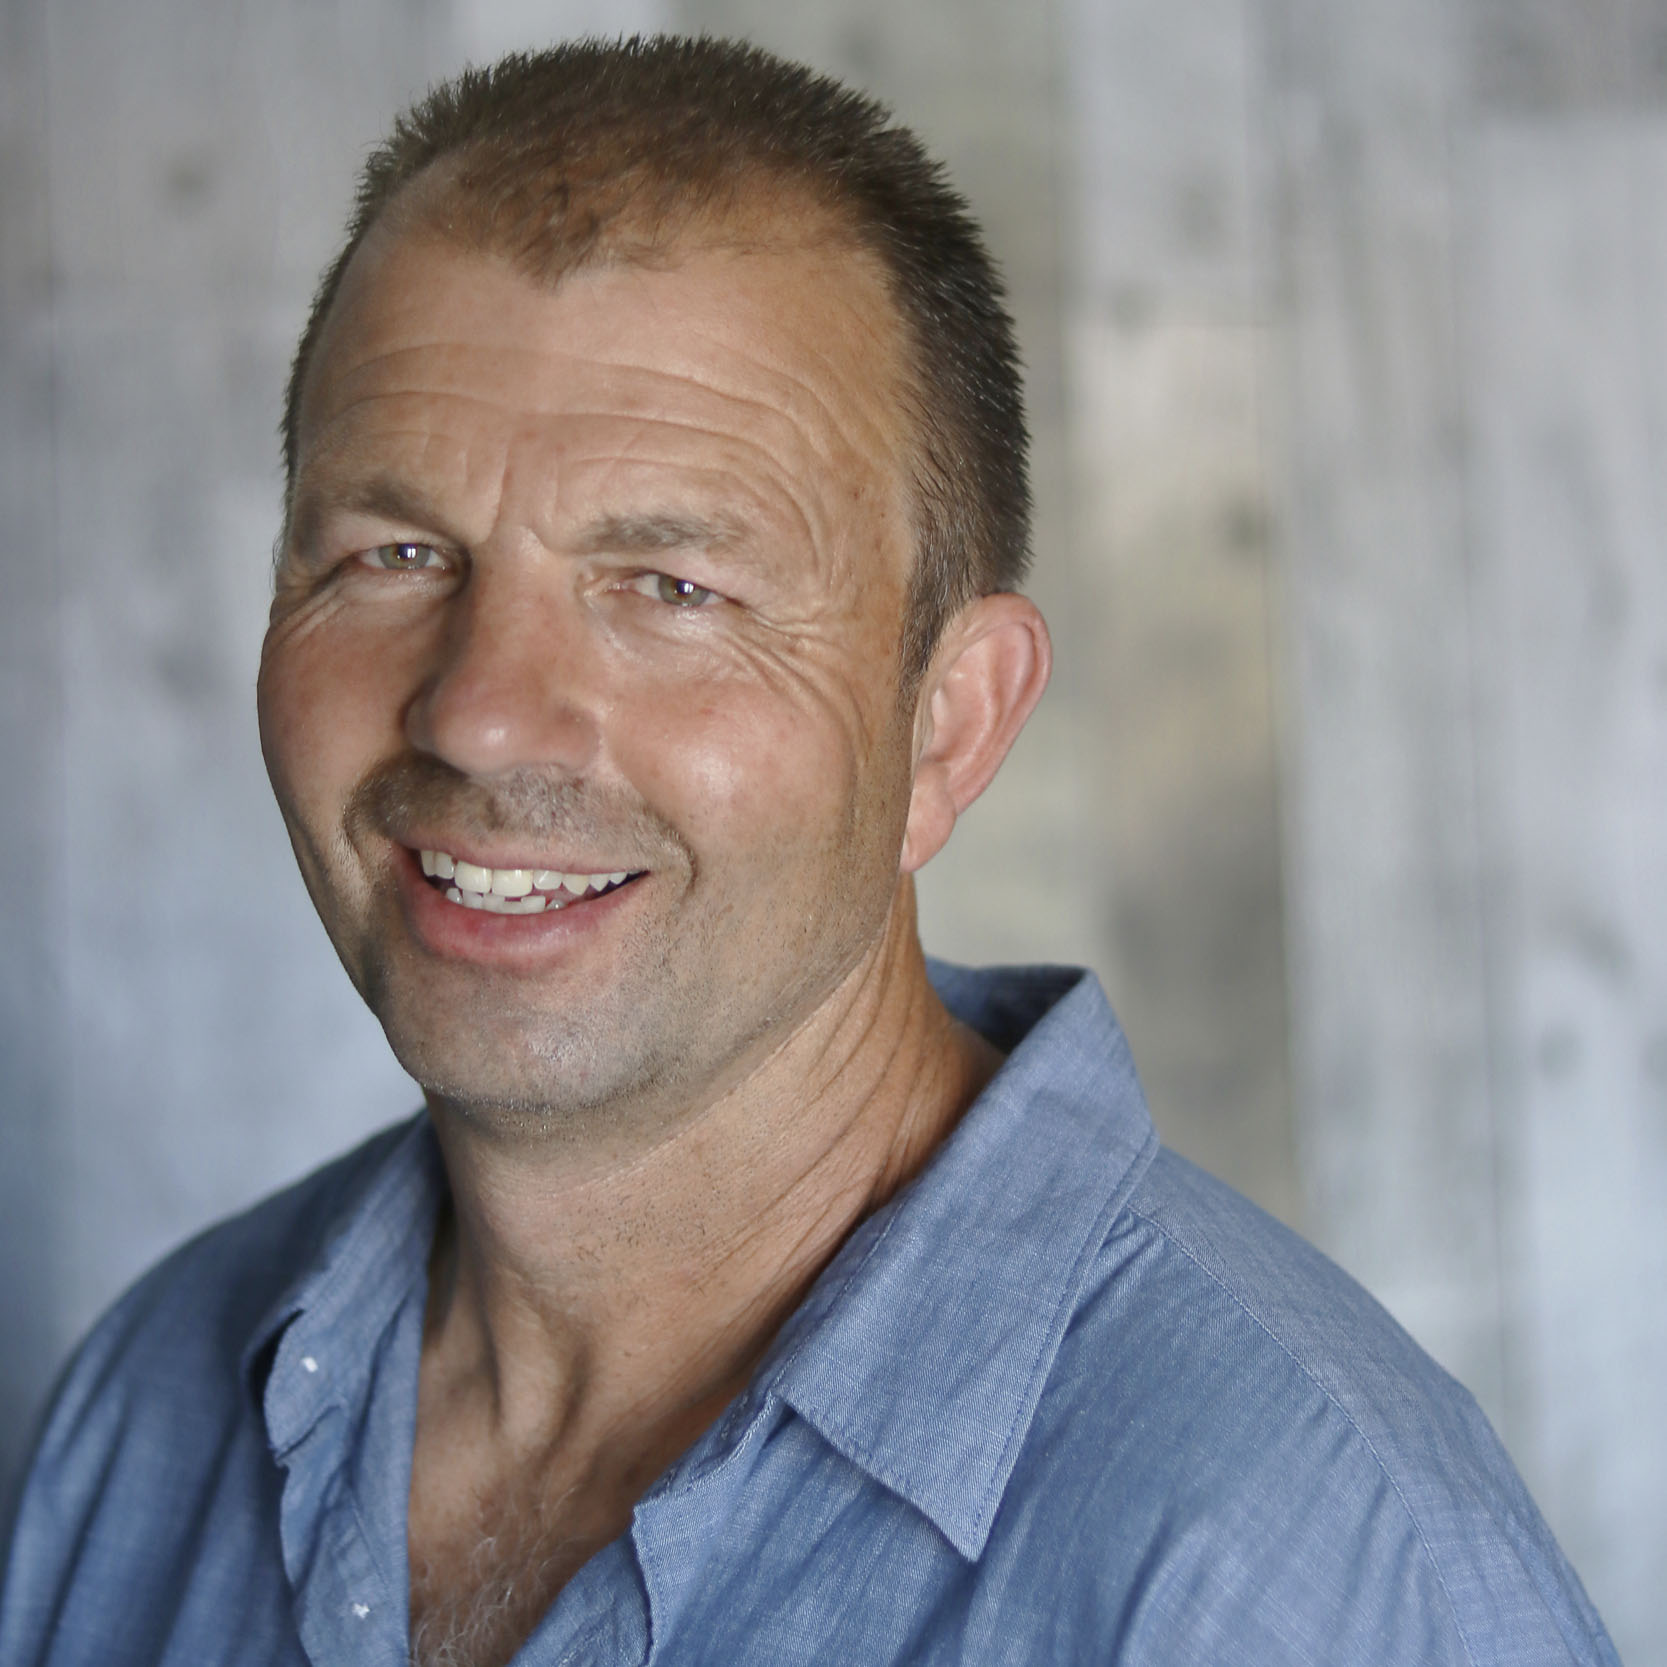 Jim van der Zalm